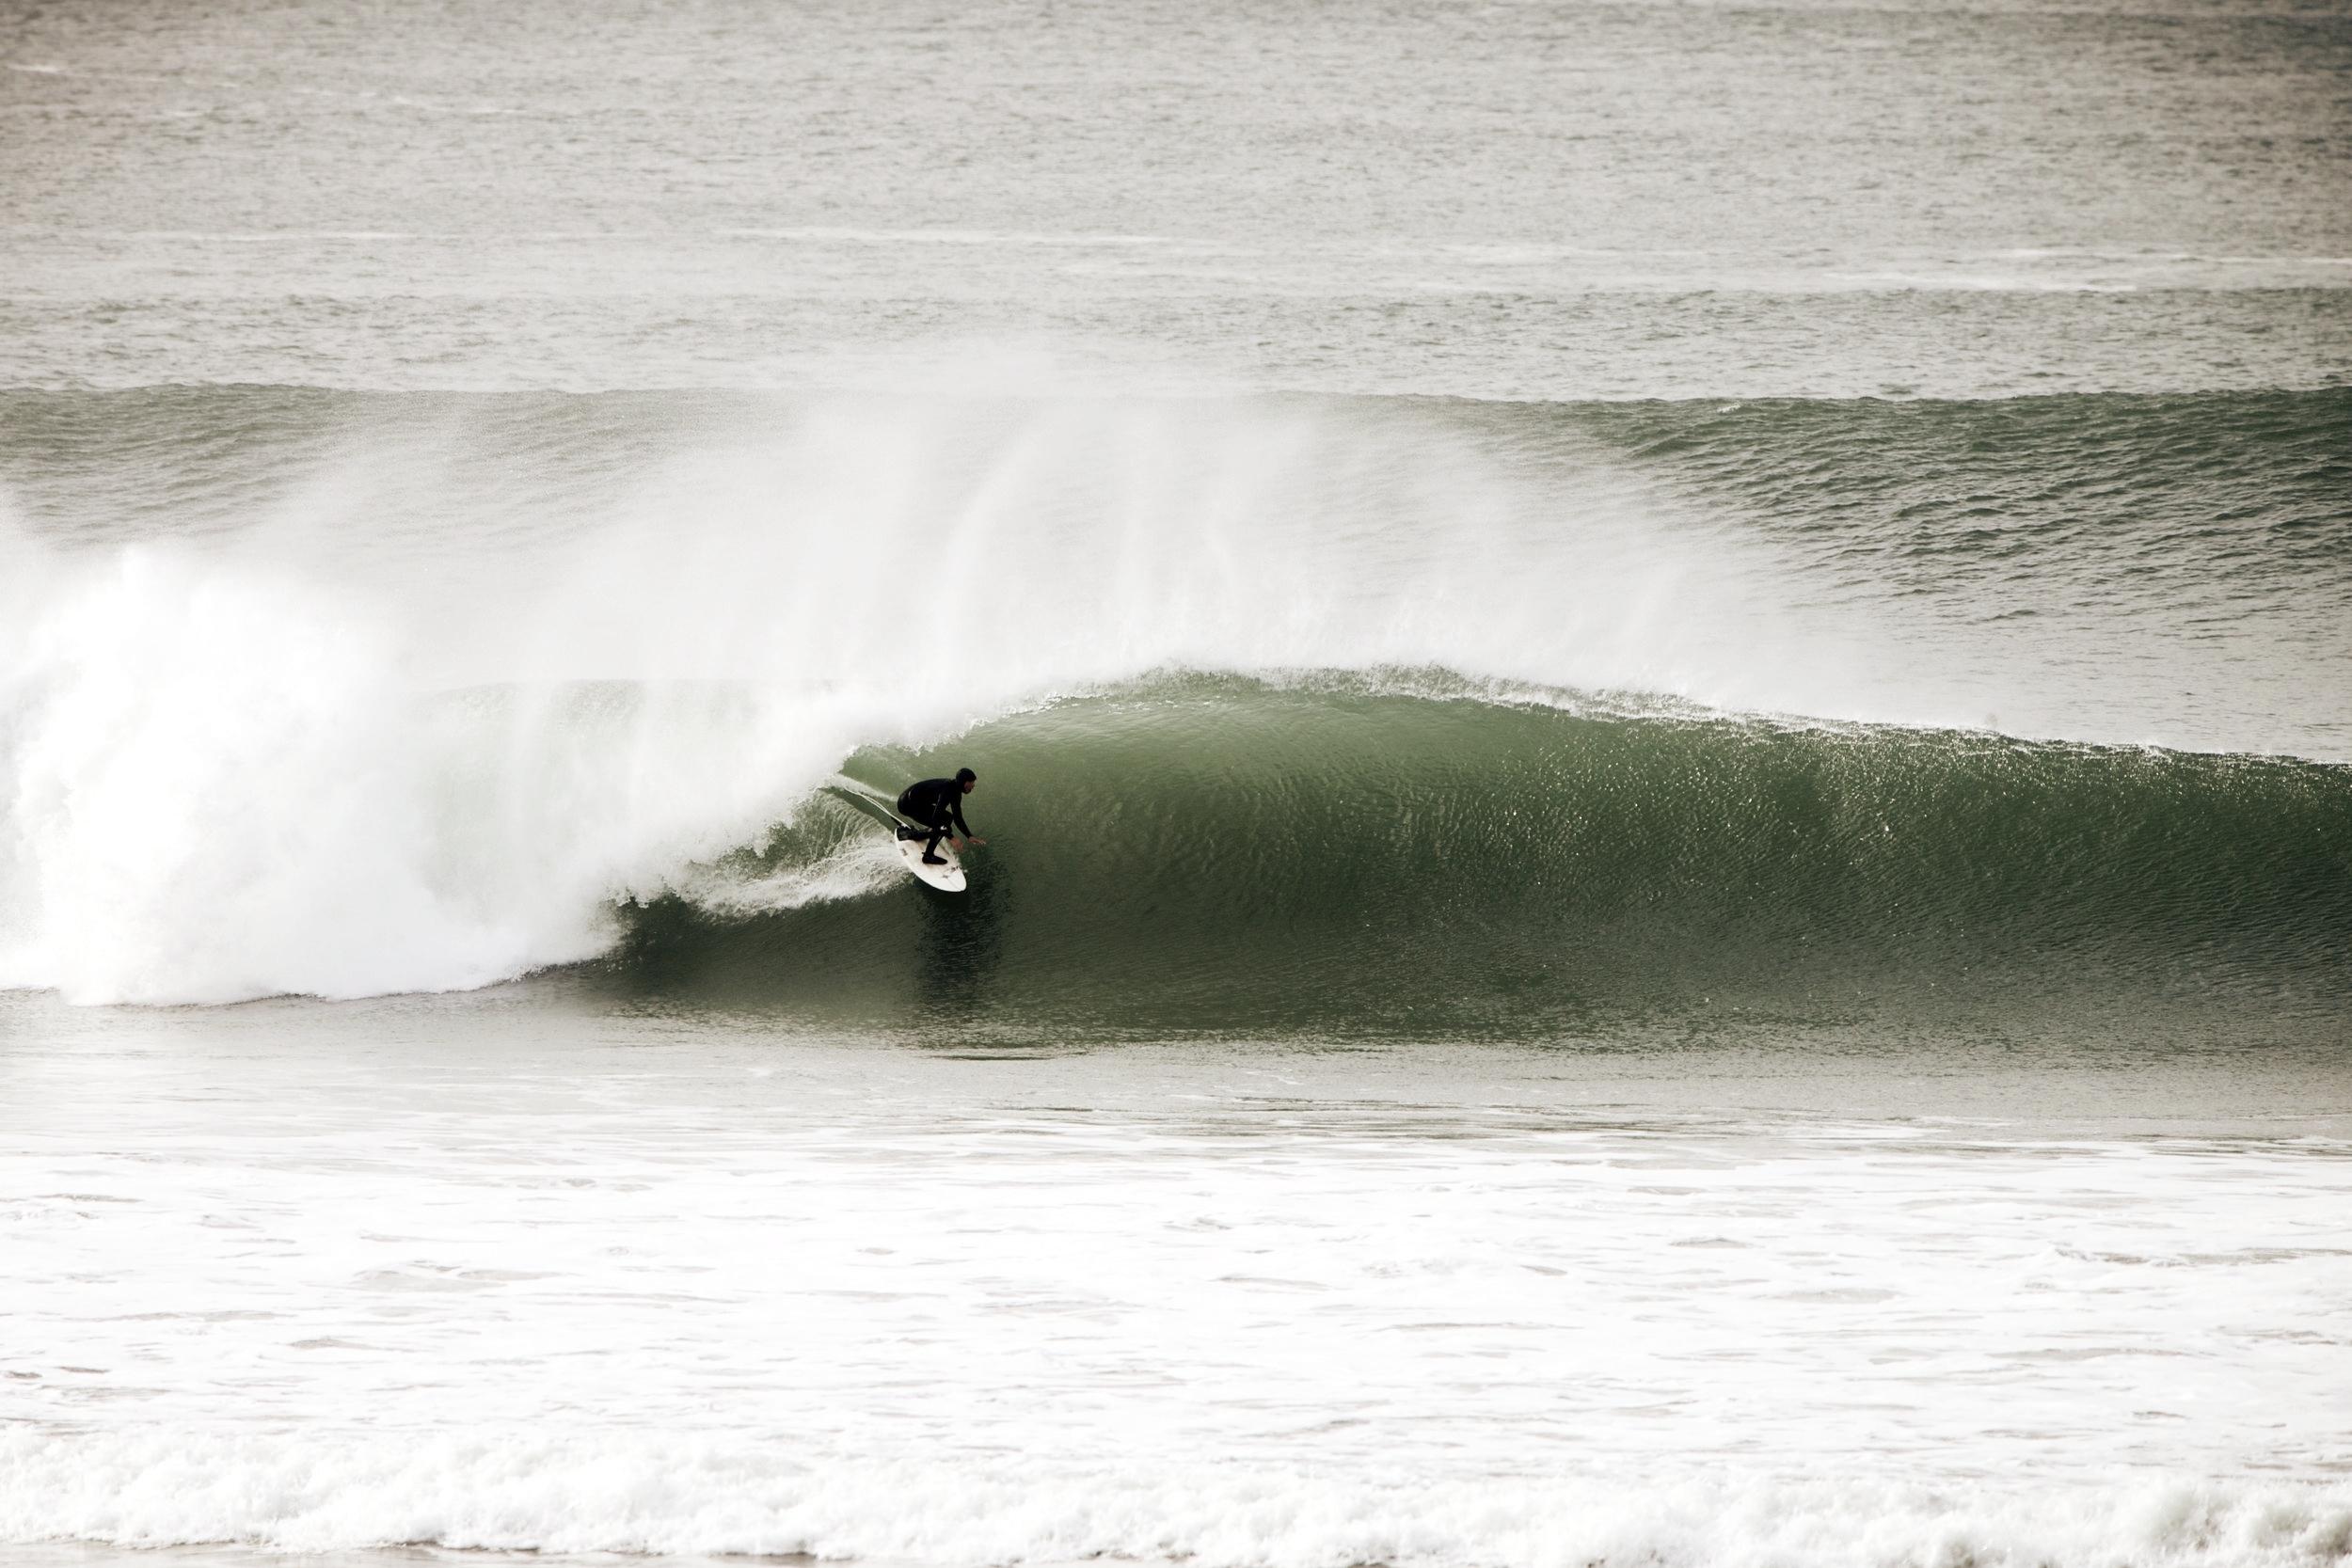 BenjaminGinsberg_DriftwoodFoto_JaredCassidy-OceanBeachSF_2013-12-27_DSC_0527.jpg